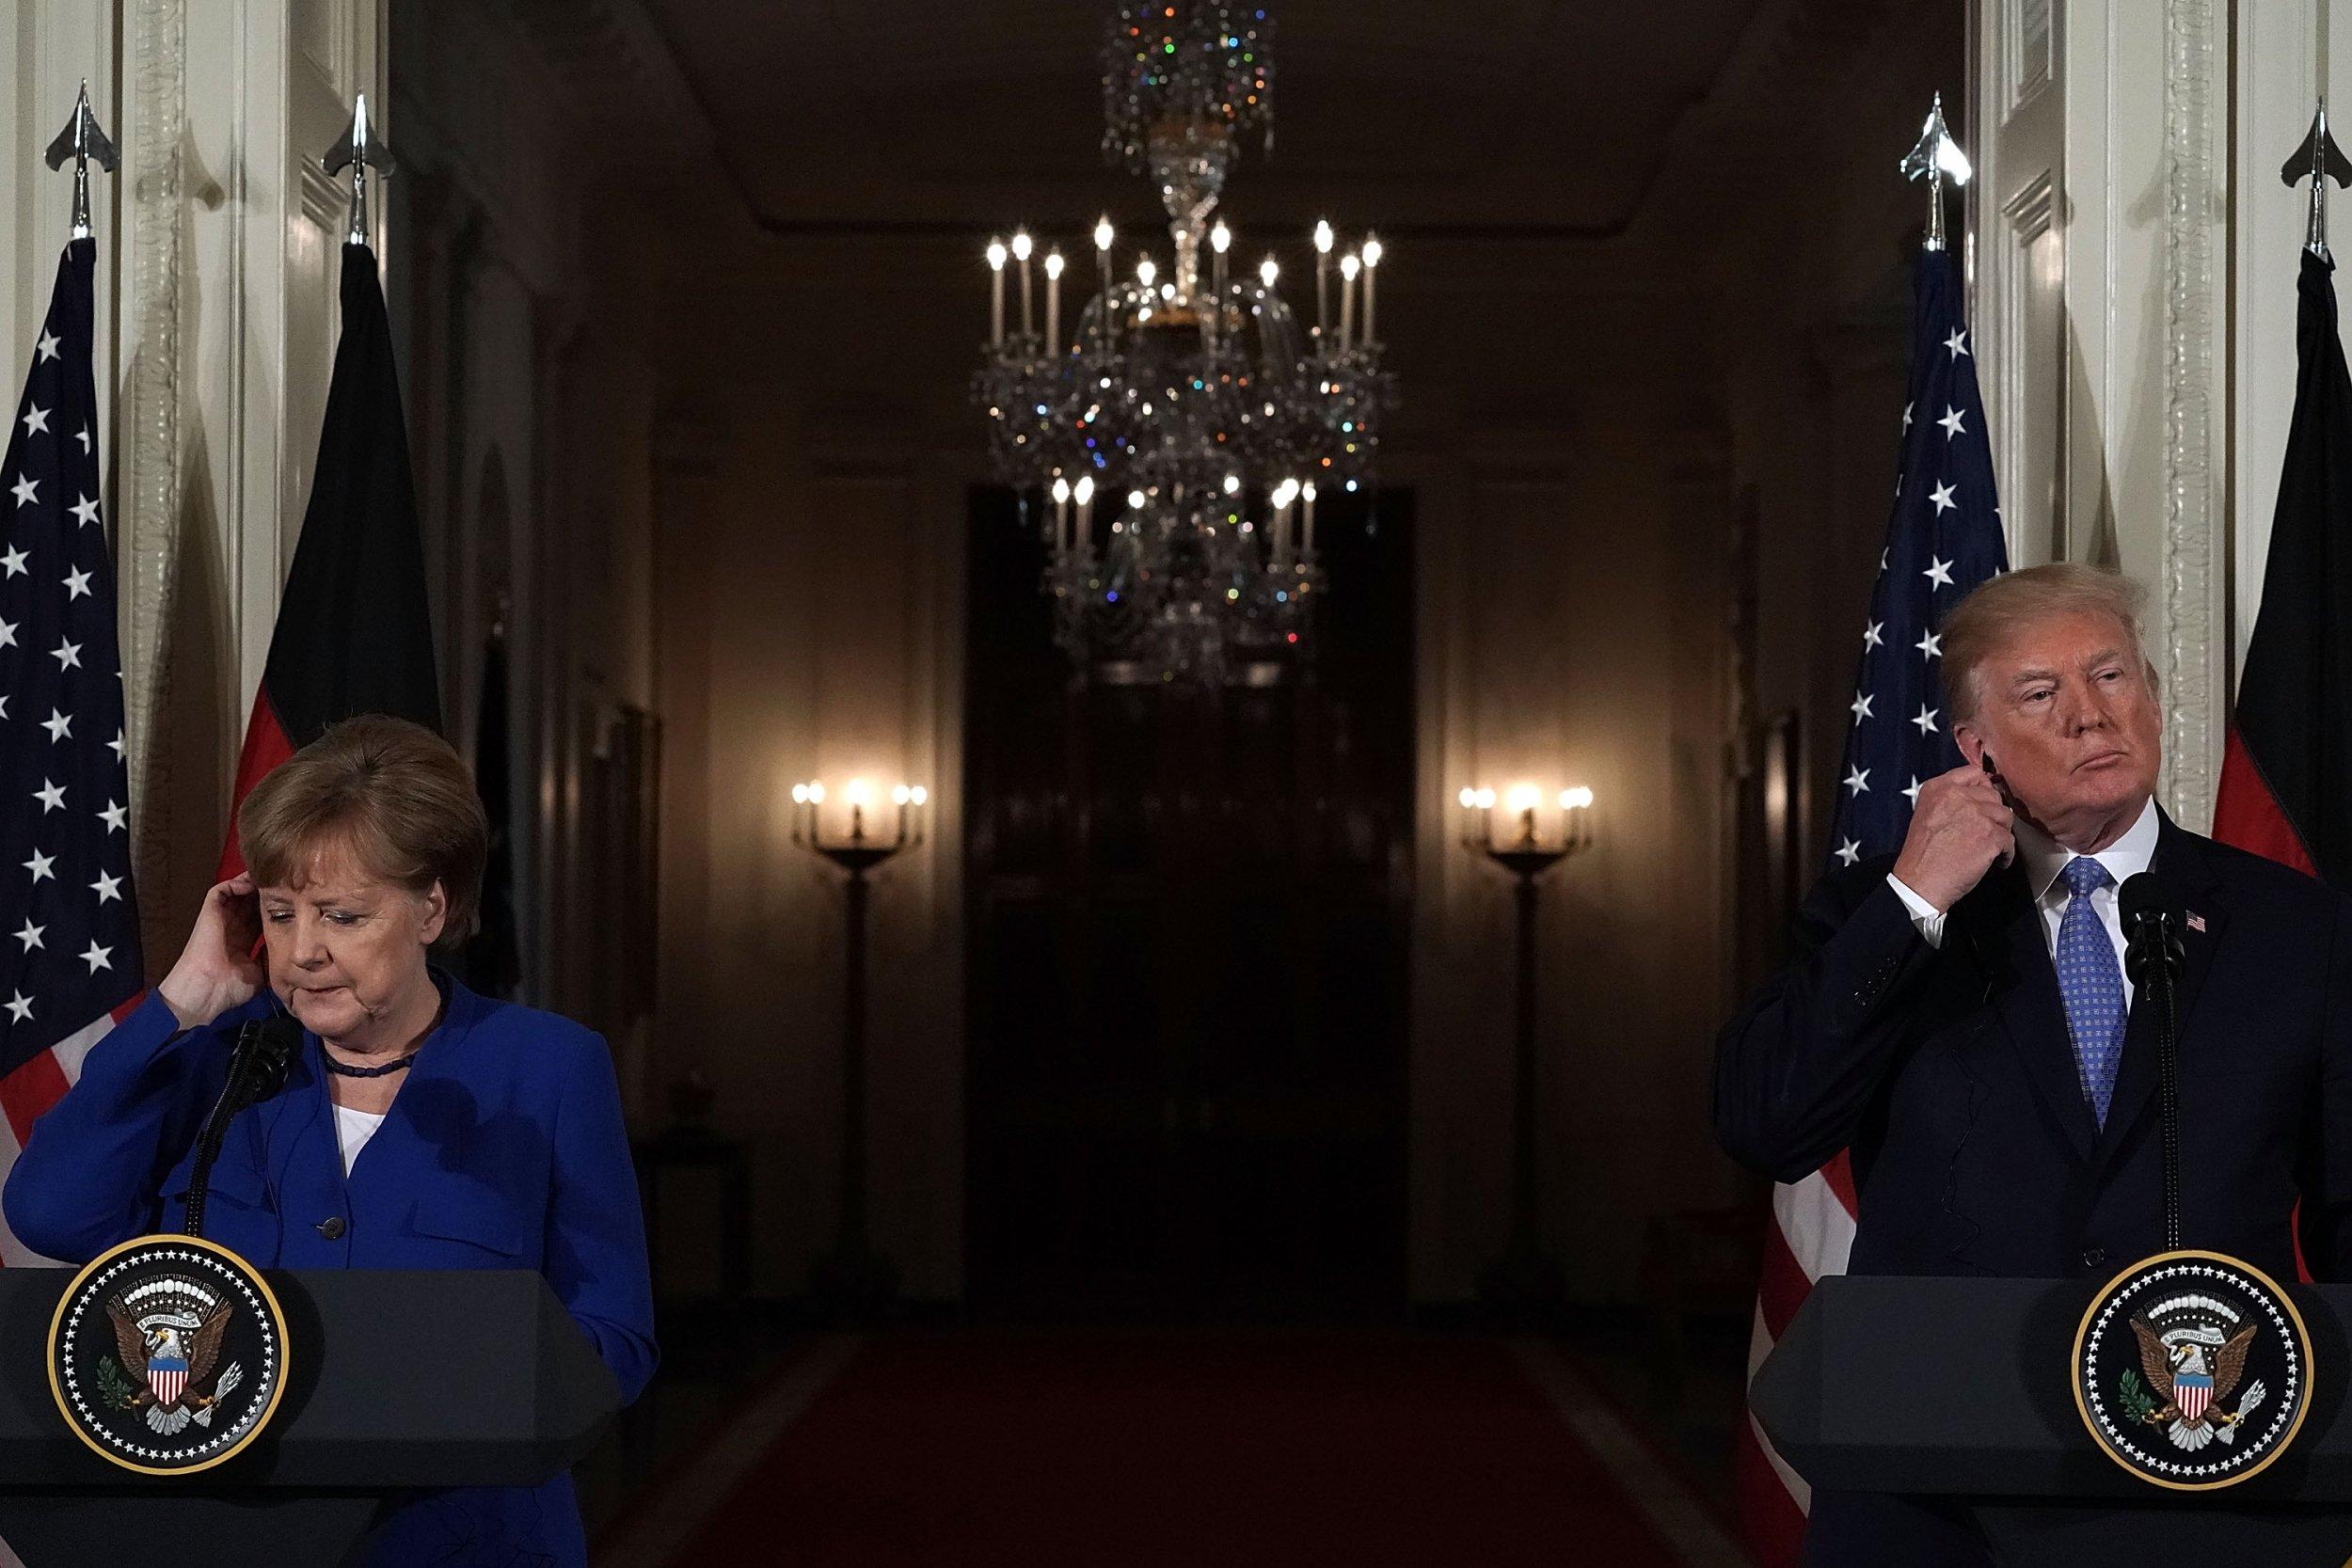 Angela Merkel and Donald Trump, April 2018